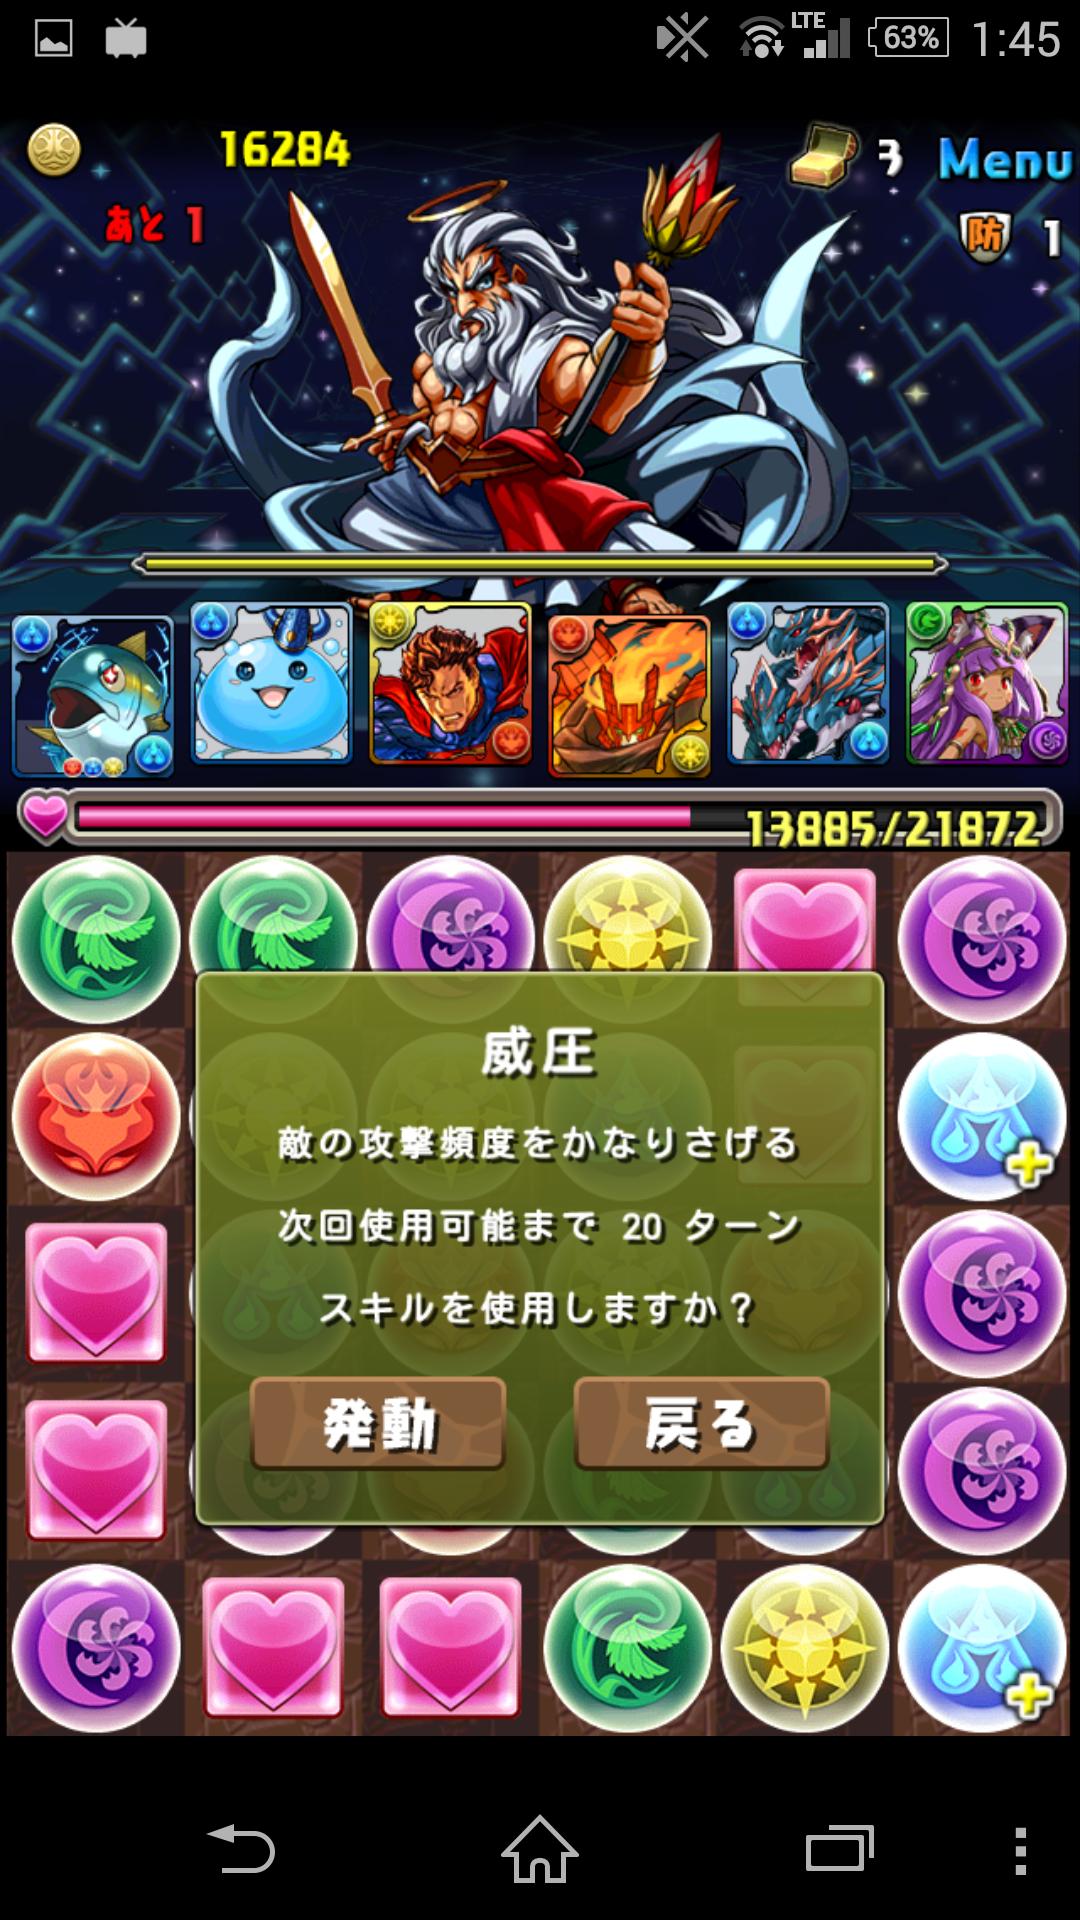 Screenshot_2014-11-13-01-45-05.png